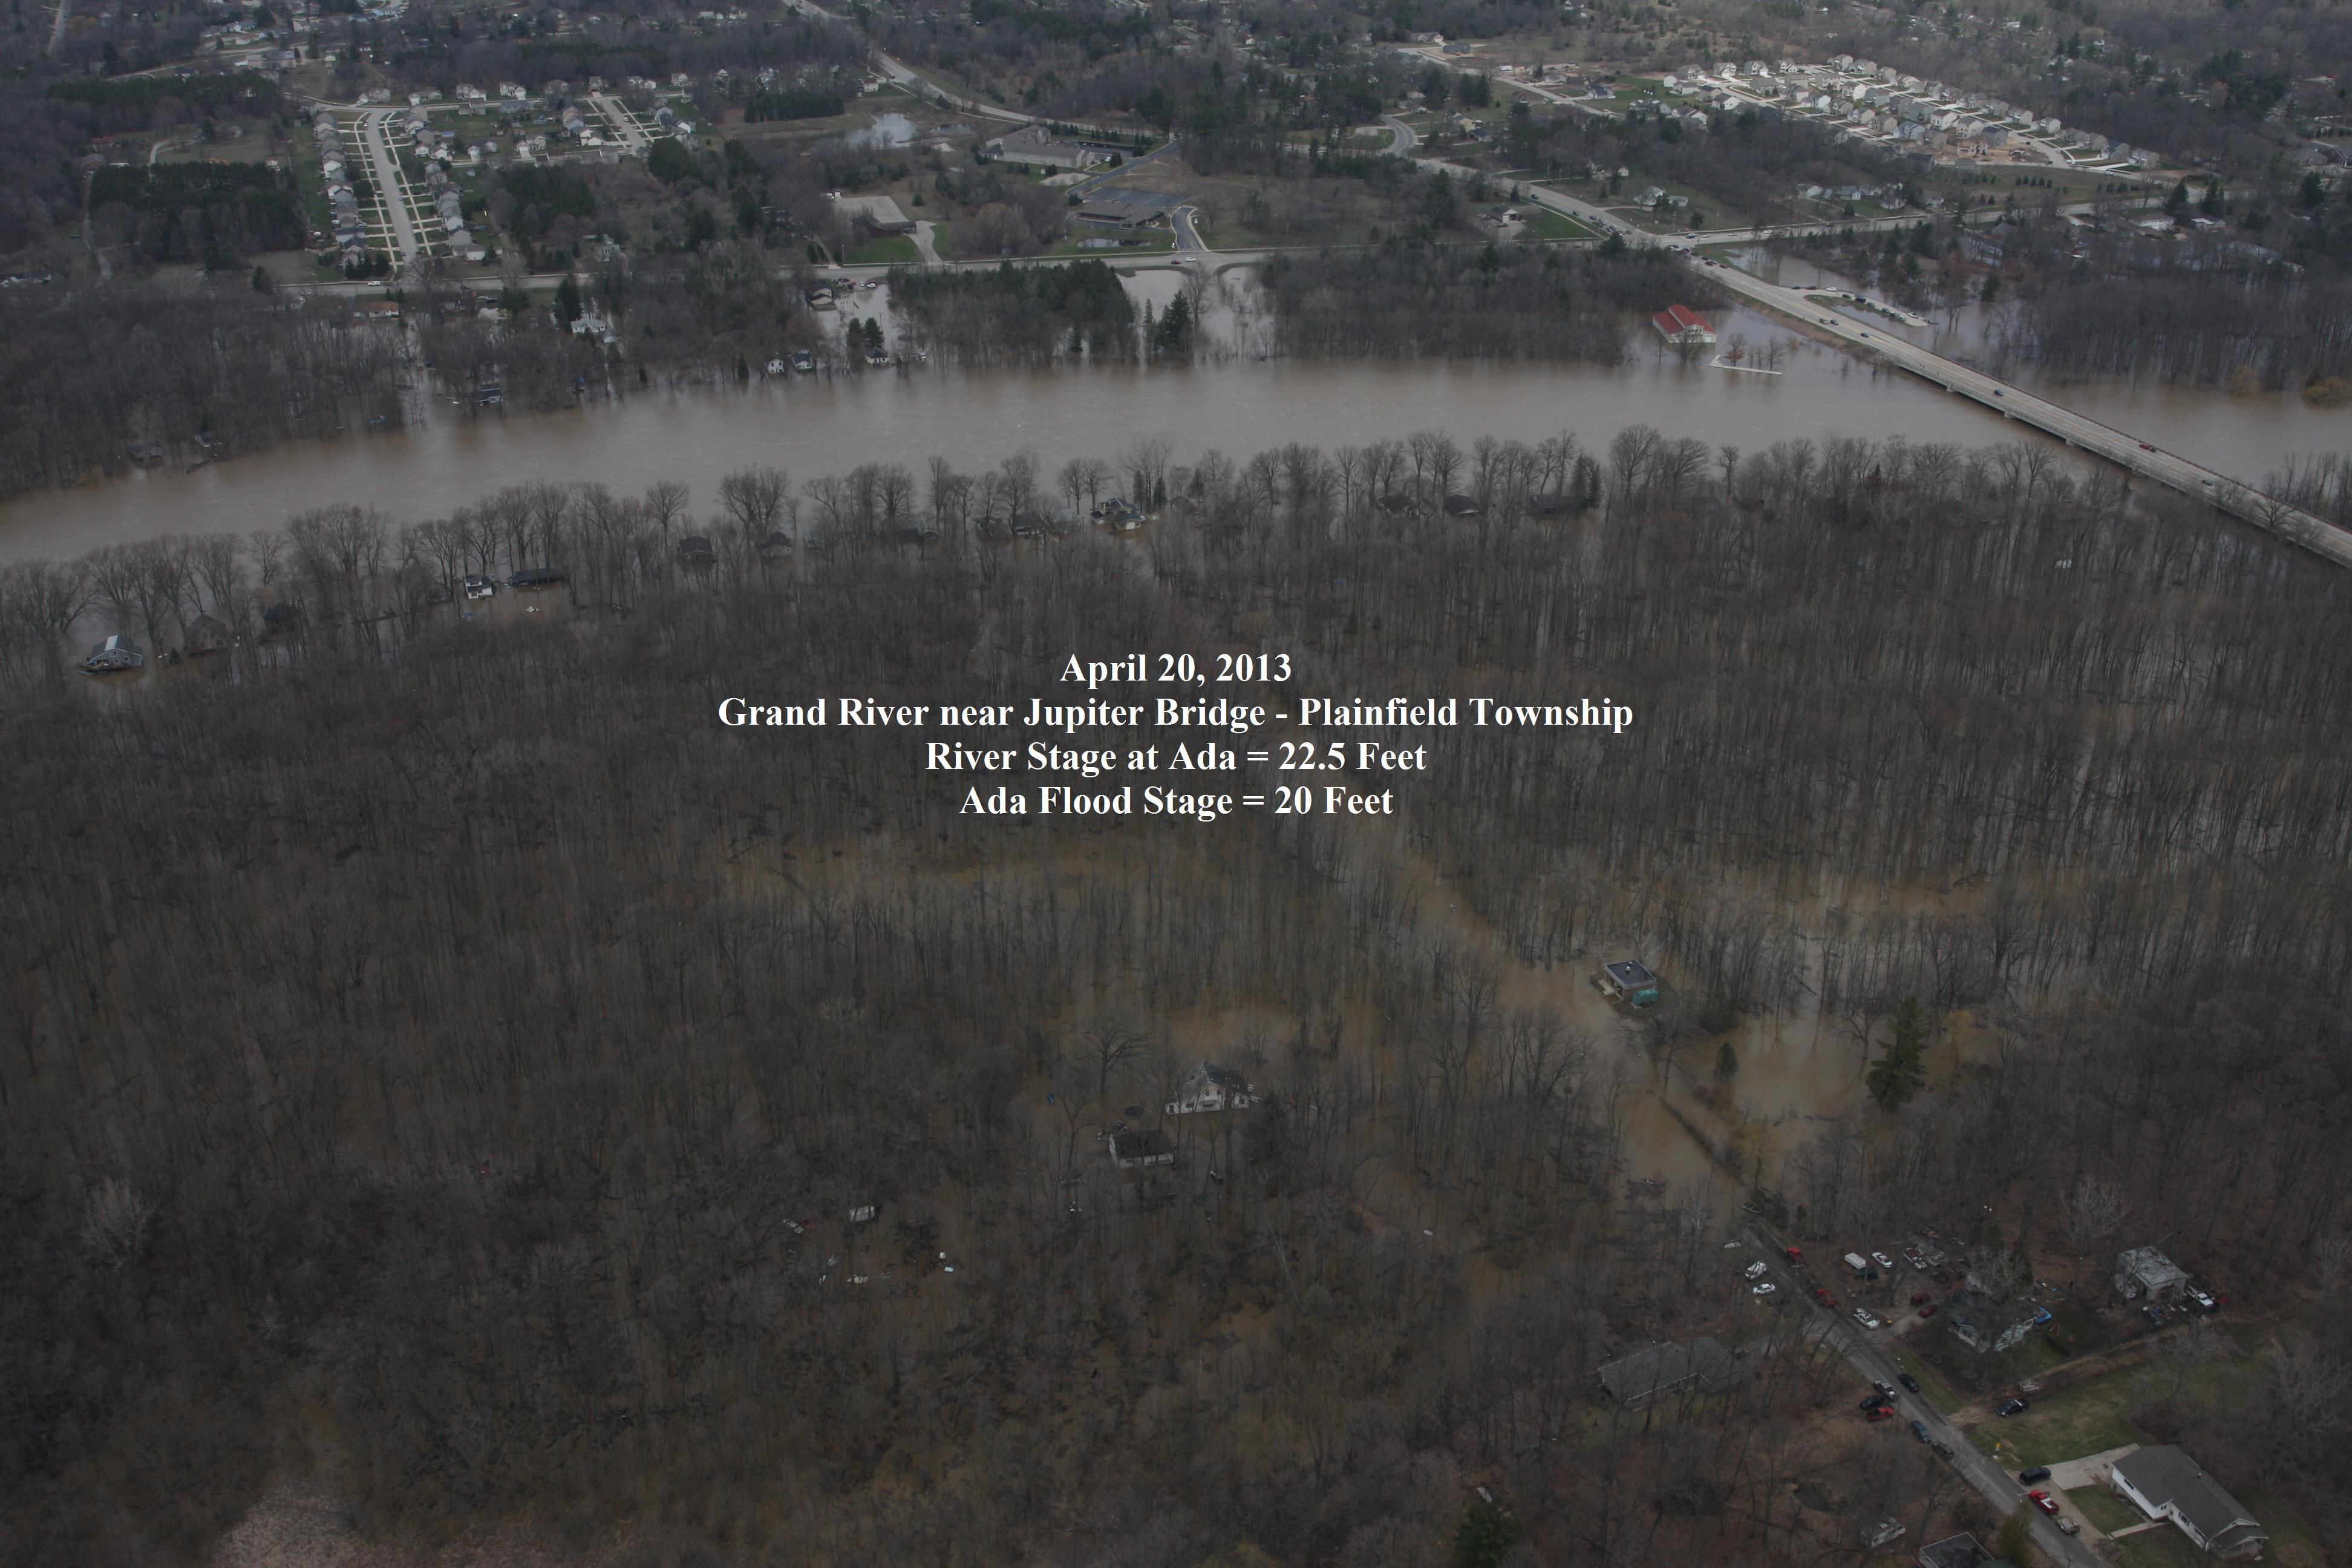 Advanced Hydrologic Prediction Service: Grand Rapids: Grand Riverjupiter township